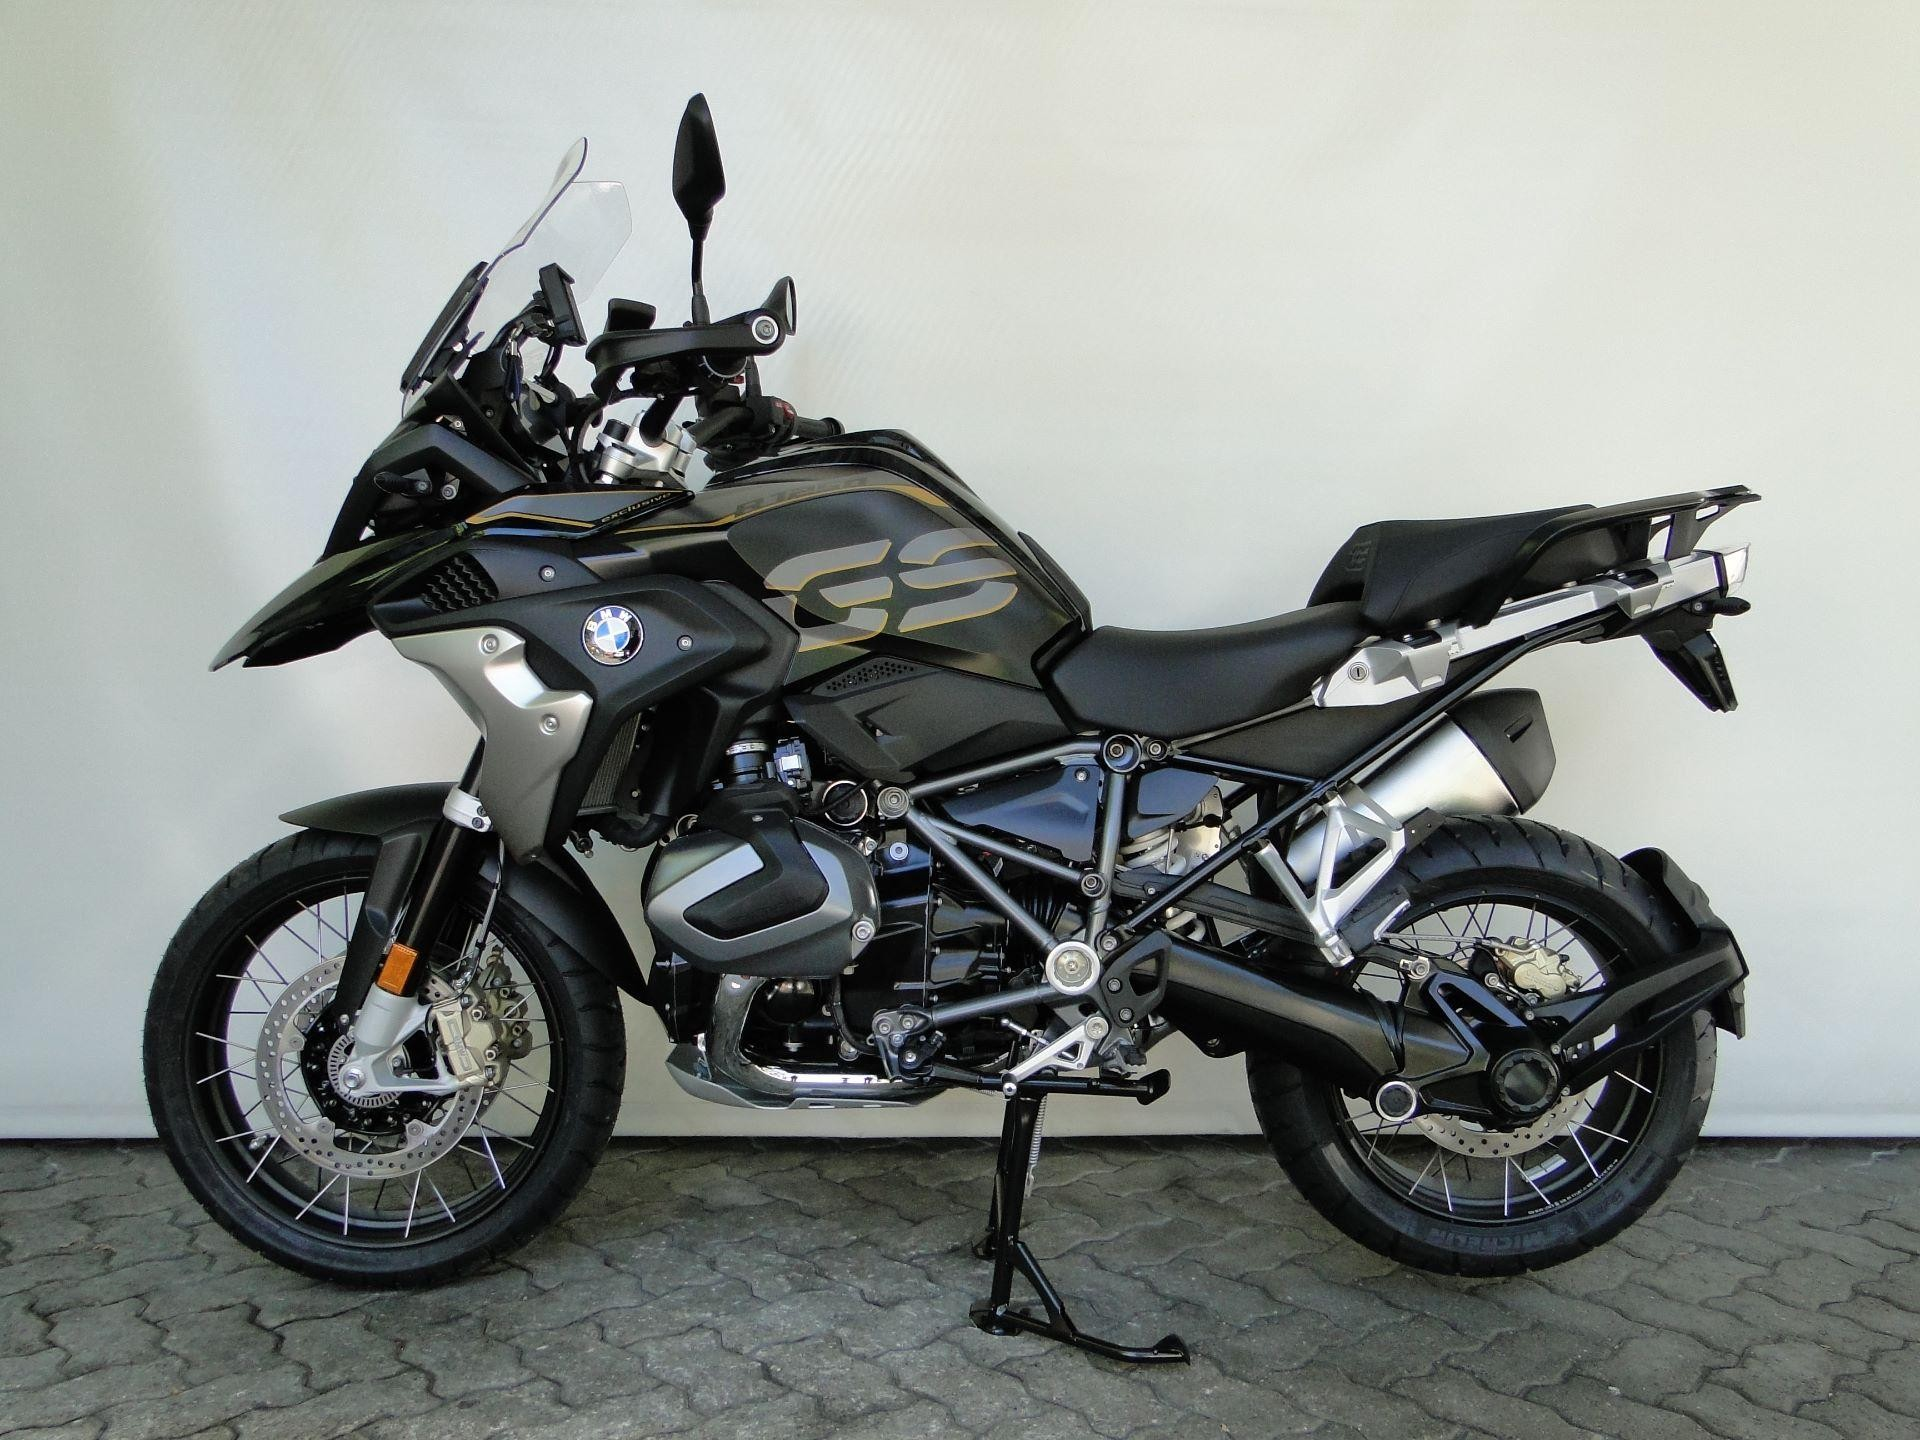 motorrad vorf hrmodell kaufen bmw r 1250 gs exclusive neu hobi moto ag winterthur. Black Bedroom Furniture Sets. Home Design Ideas